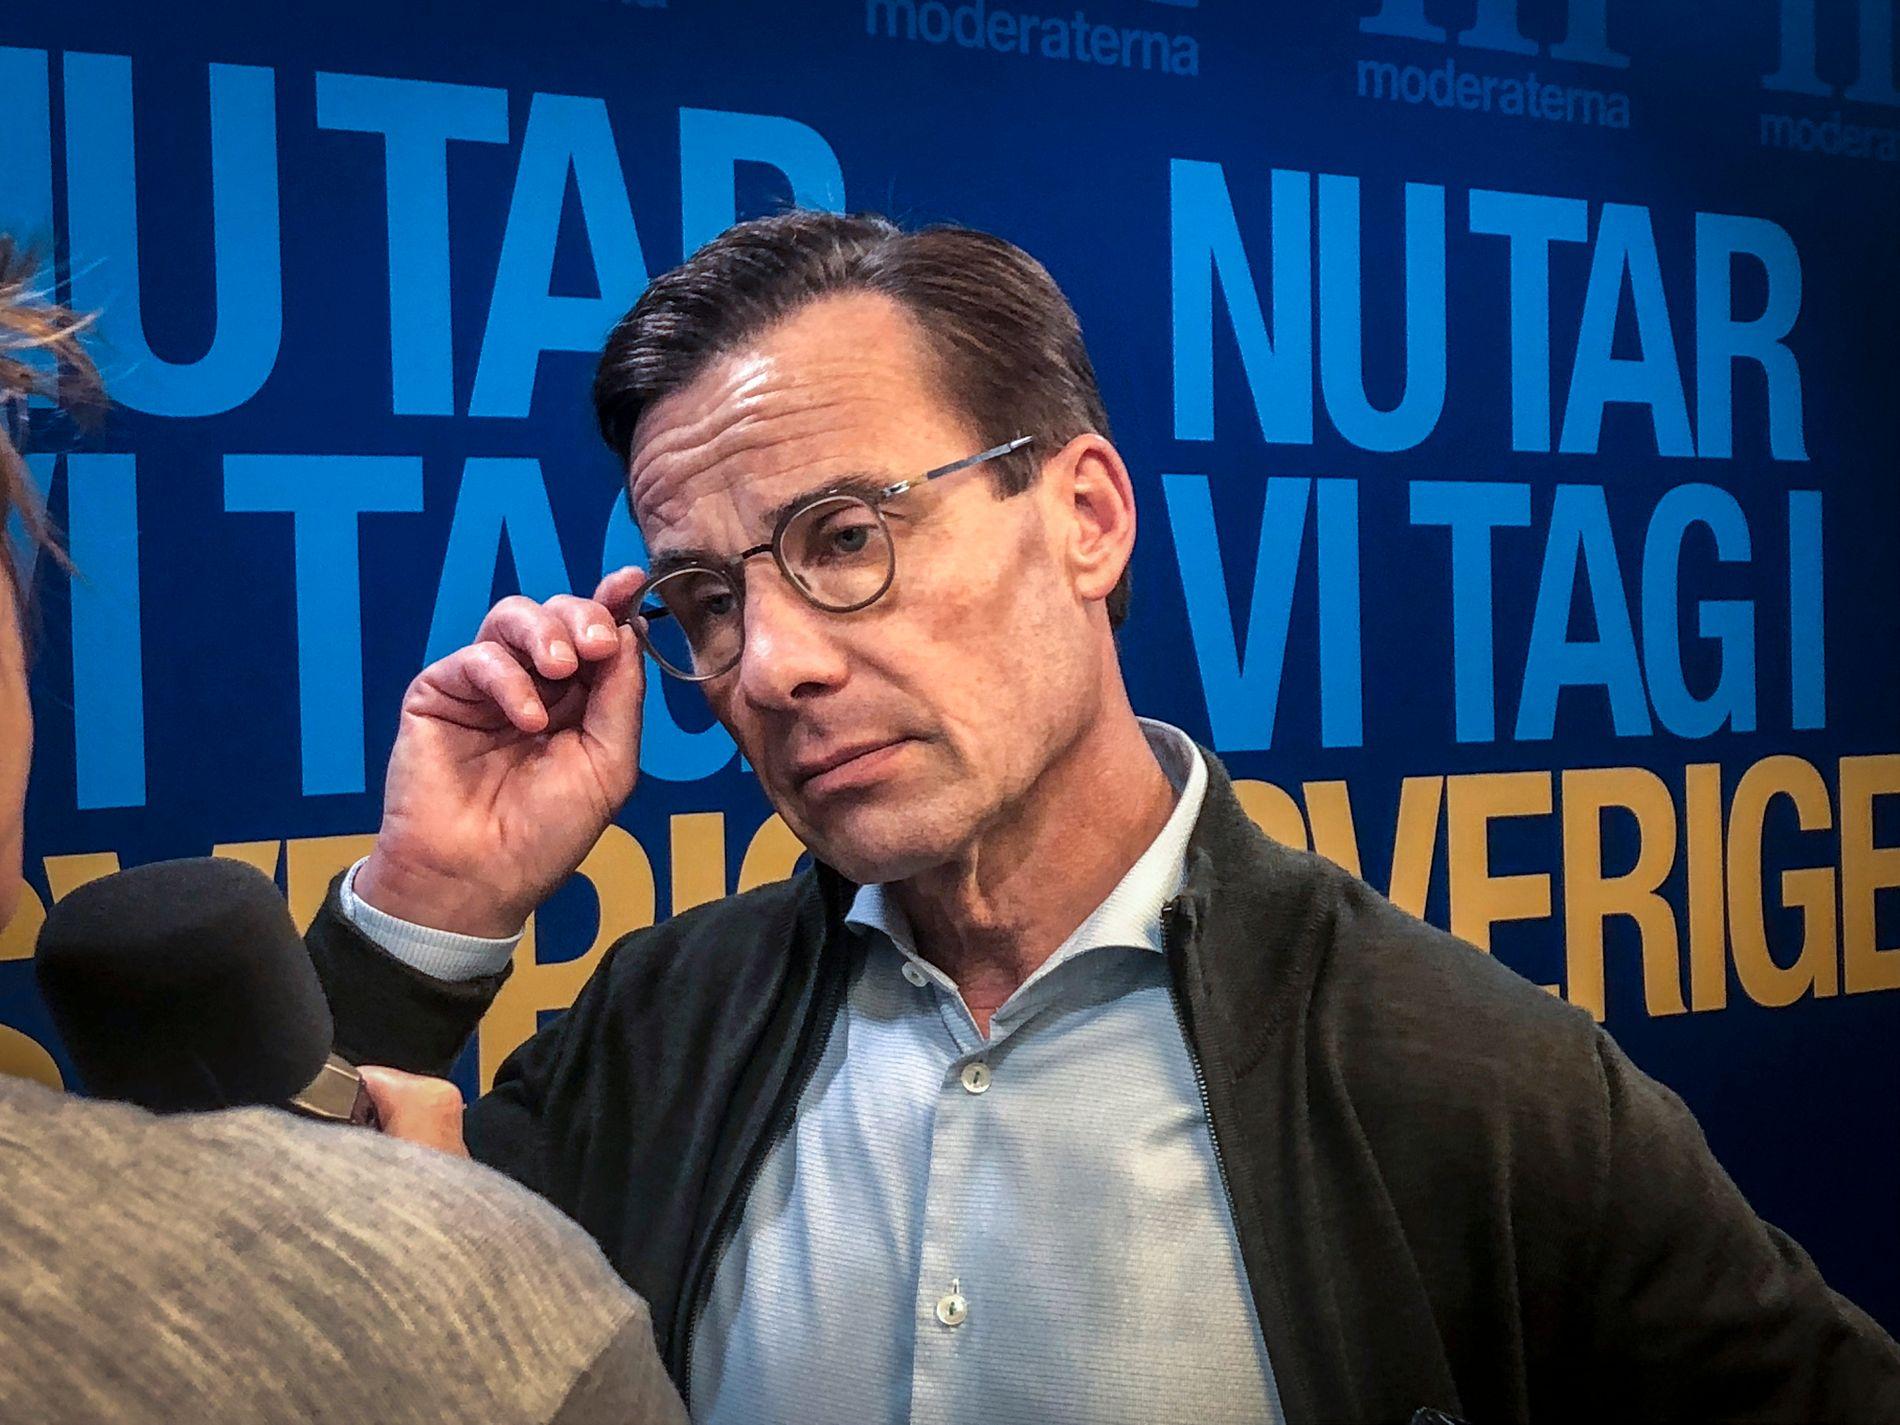 STATSMINISTERKANDIDAT: Moderaternas partileder Ulf Kristersson er den svenske valgkampens hovedutfordrer.